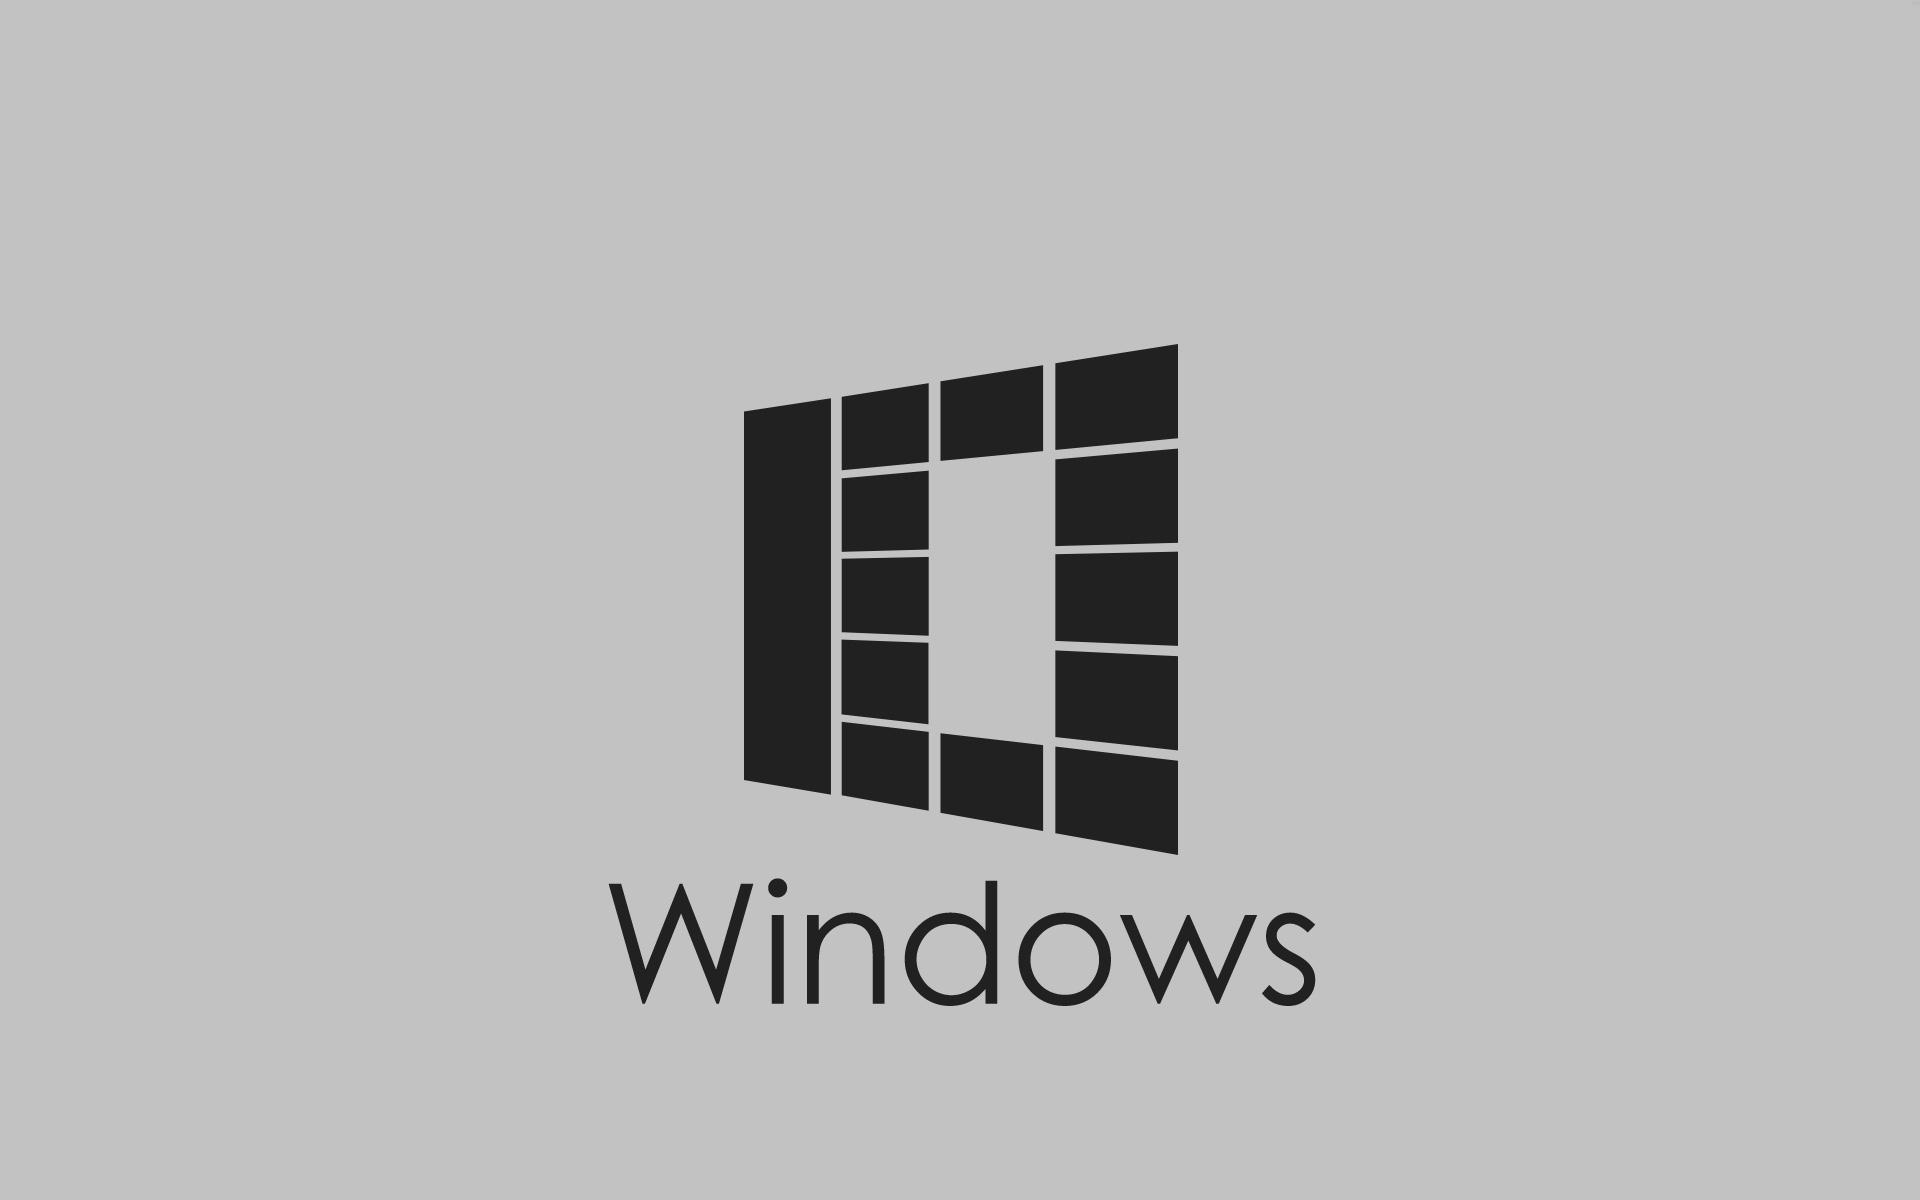 Windows 10 Wallpaper 1080p Full HD Grey Abstract 10